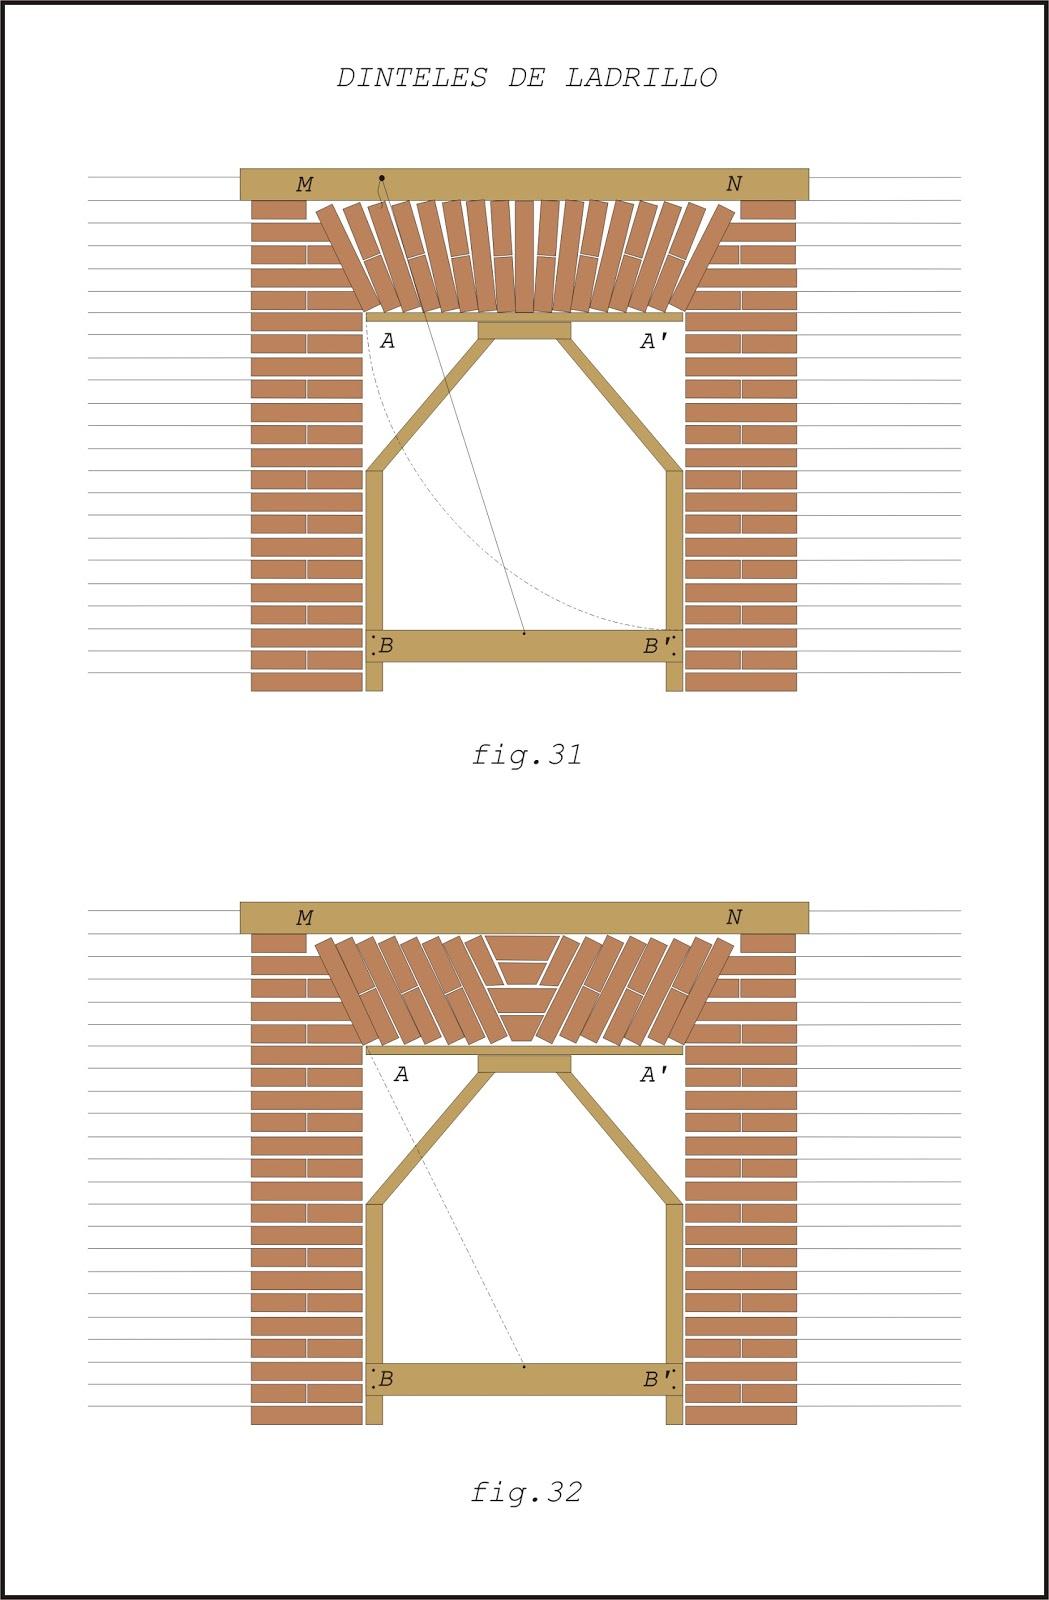 Teor a sobre alba iler a b sica aberturas en los muros for Pared de 15 ladrillo comun